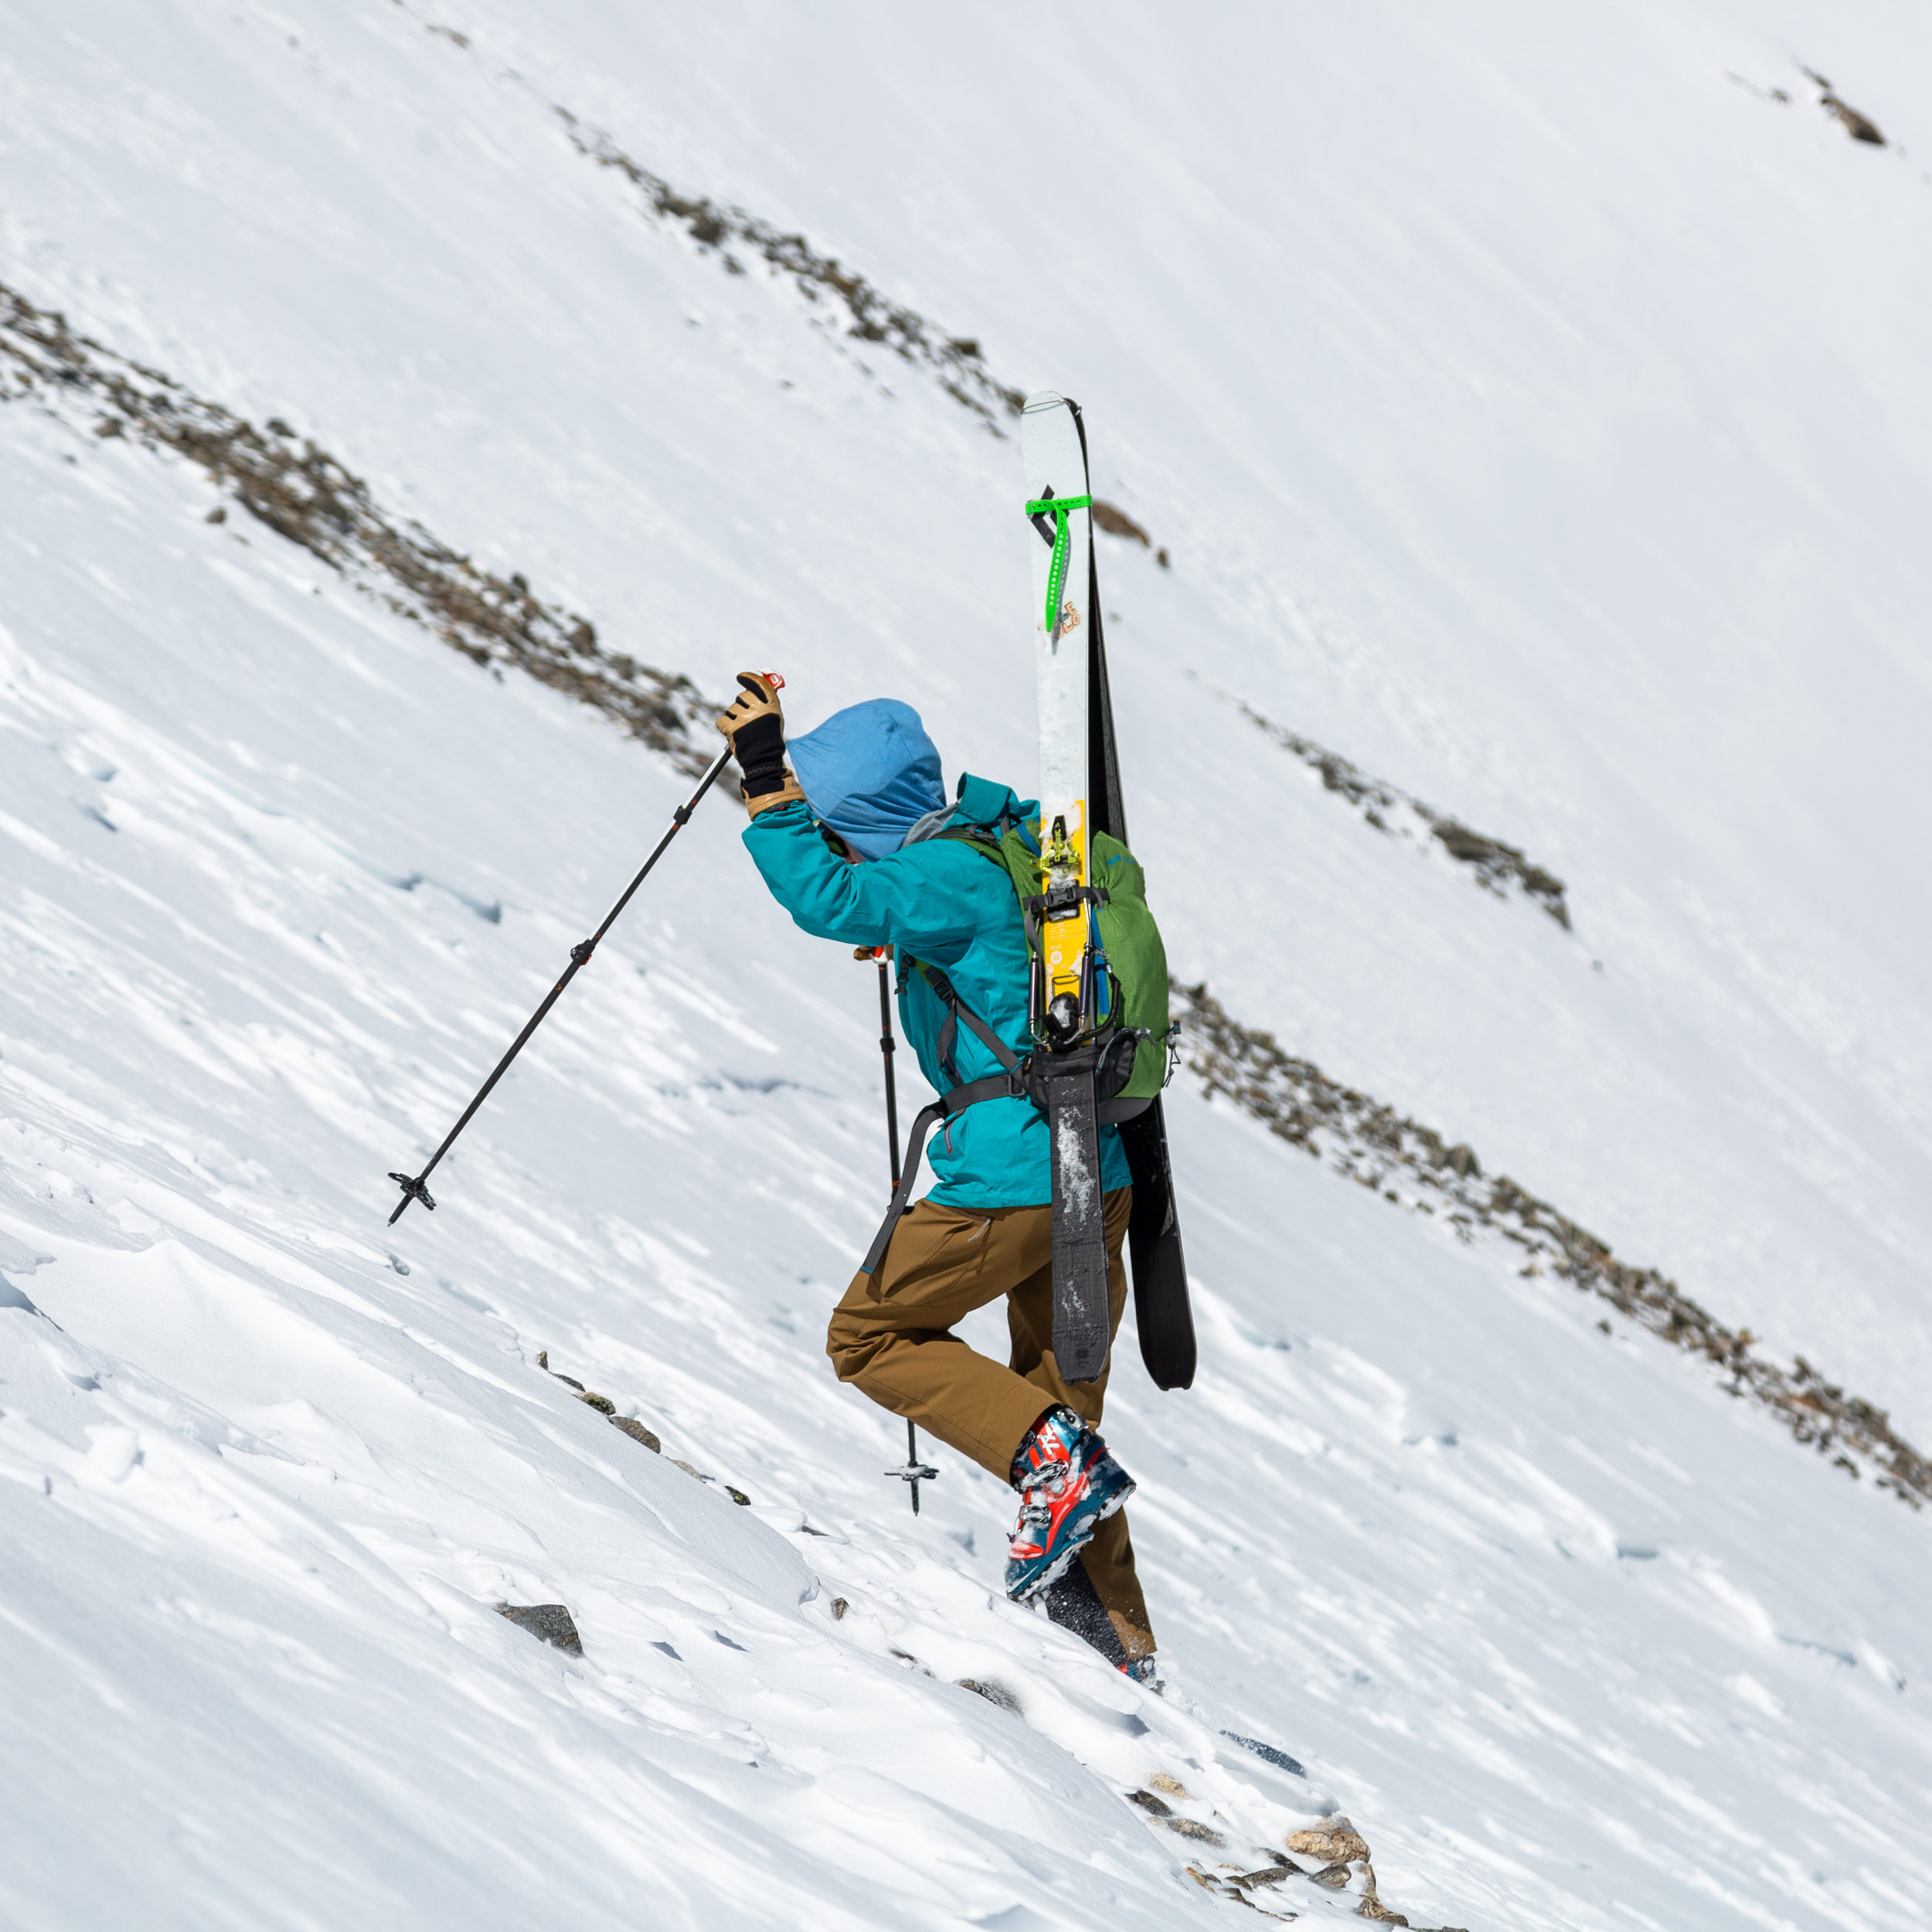 JTG_Skiing-7.jpg